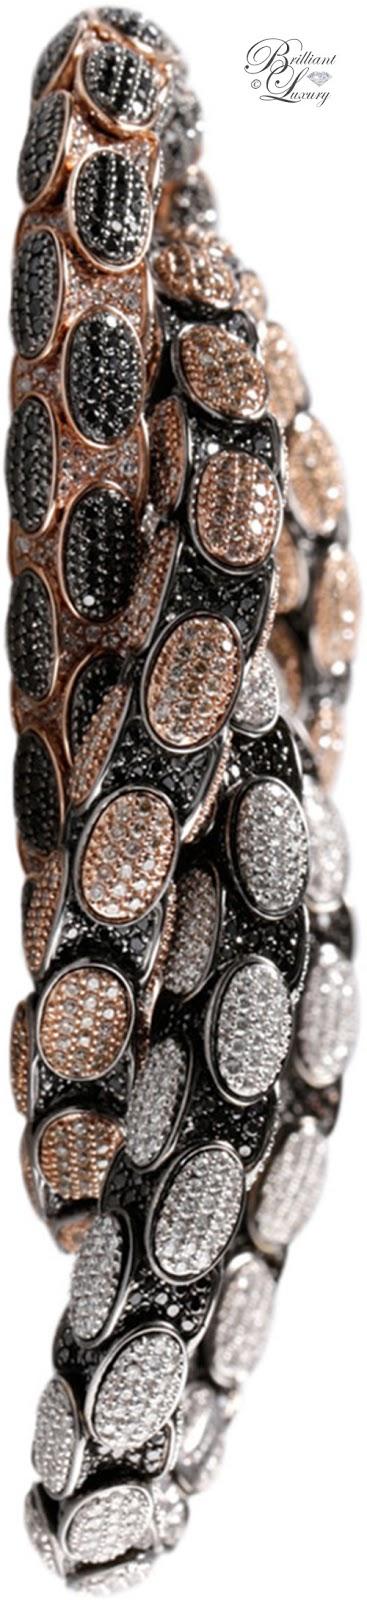 Brilliant Luxury ♦ Roberto Demeglio Anaconda Bracelet With Diamonds